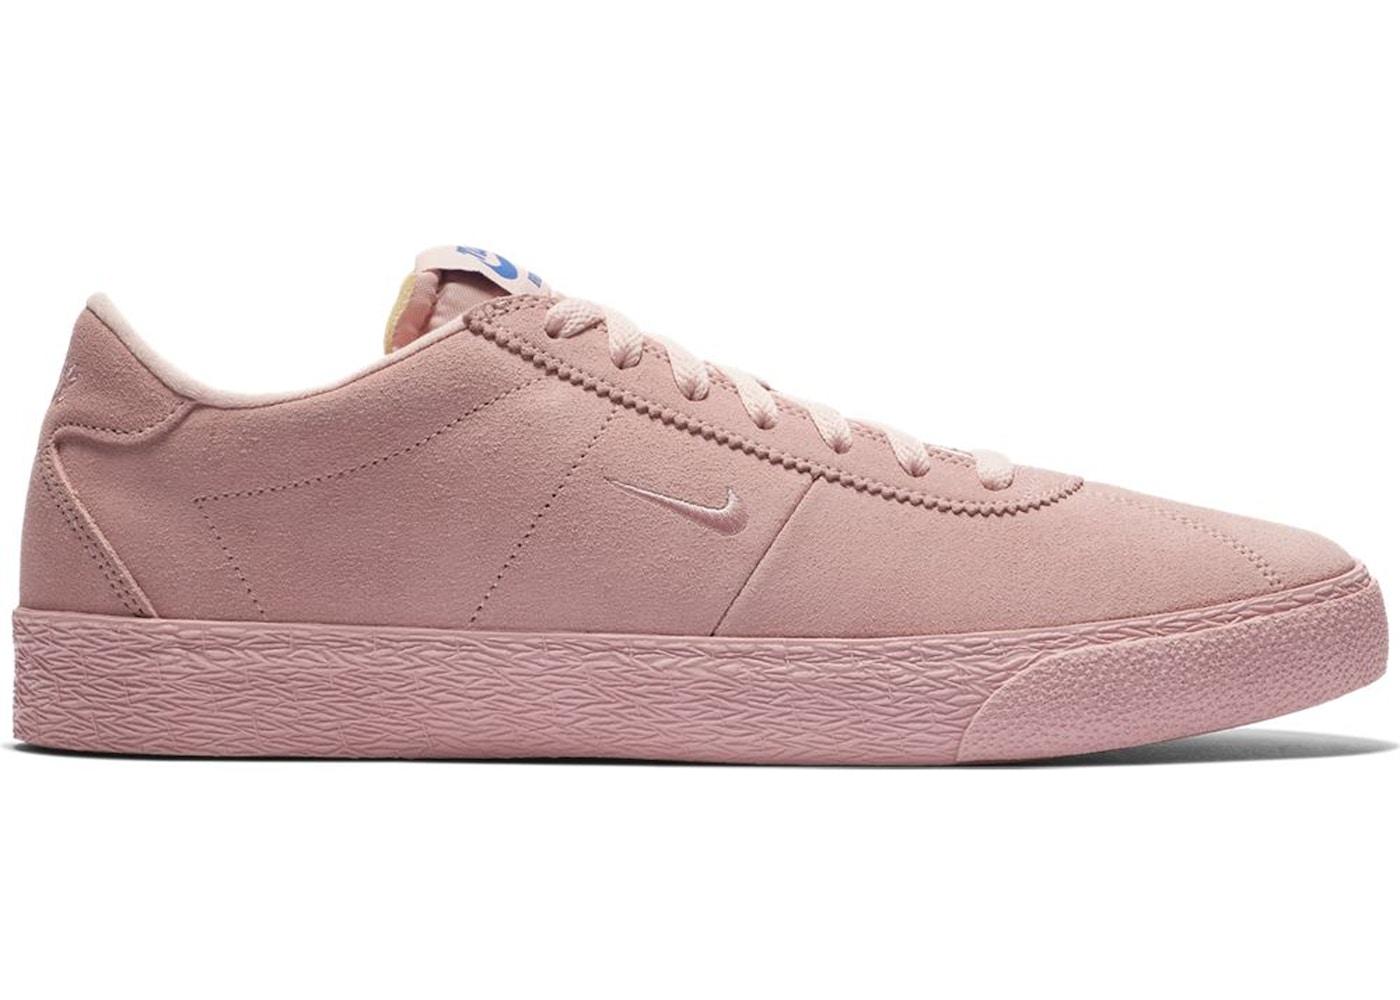 new style f4f9d 41d77 Nike SB Zoom Bruin NBA Pink